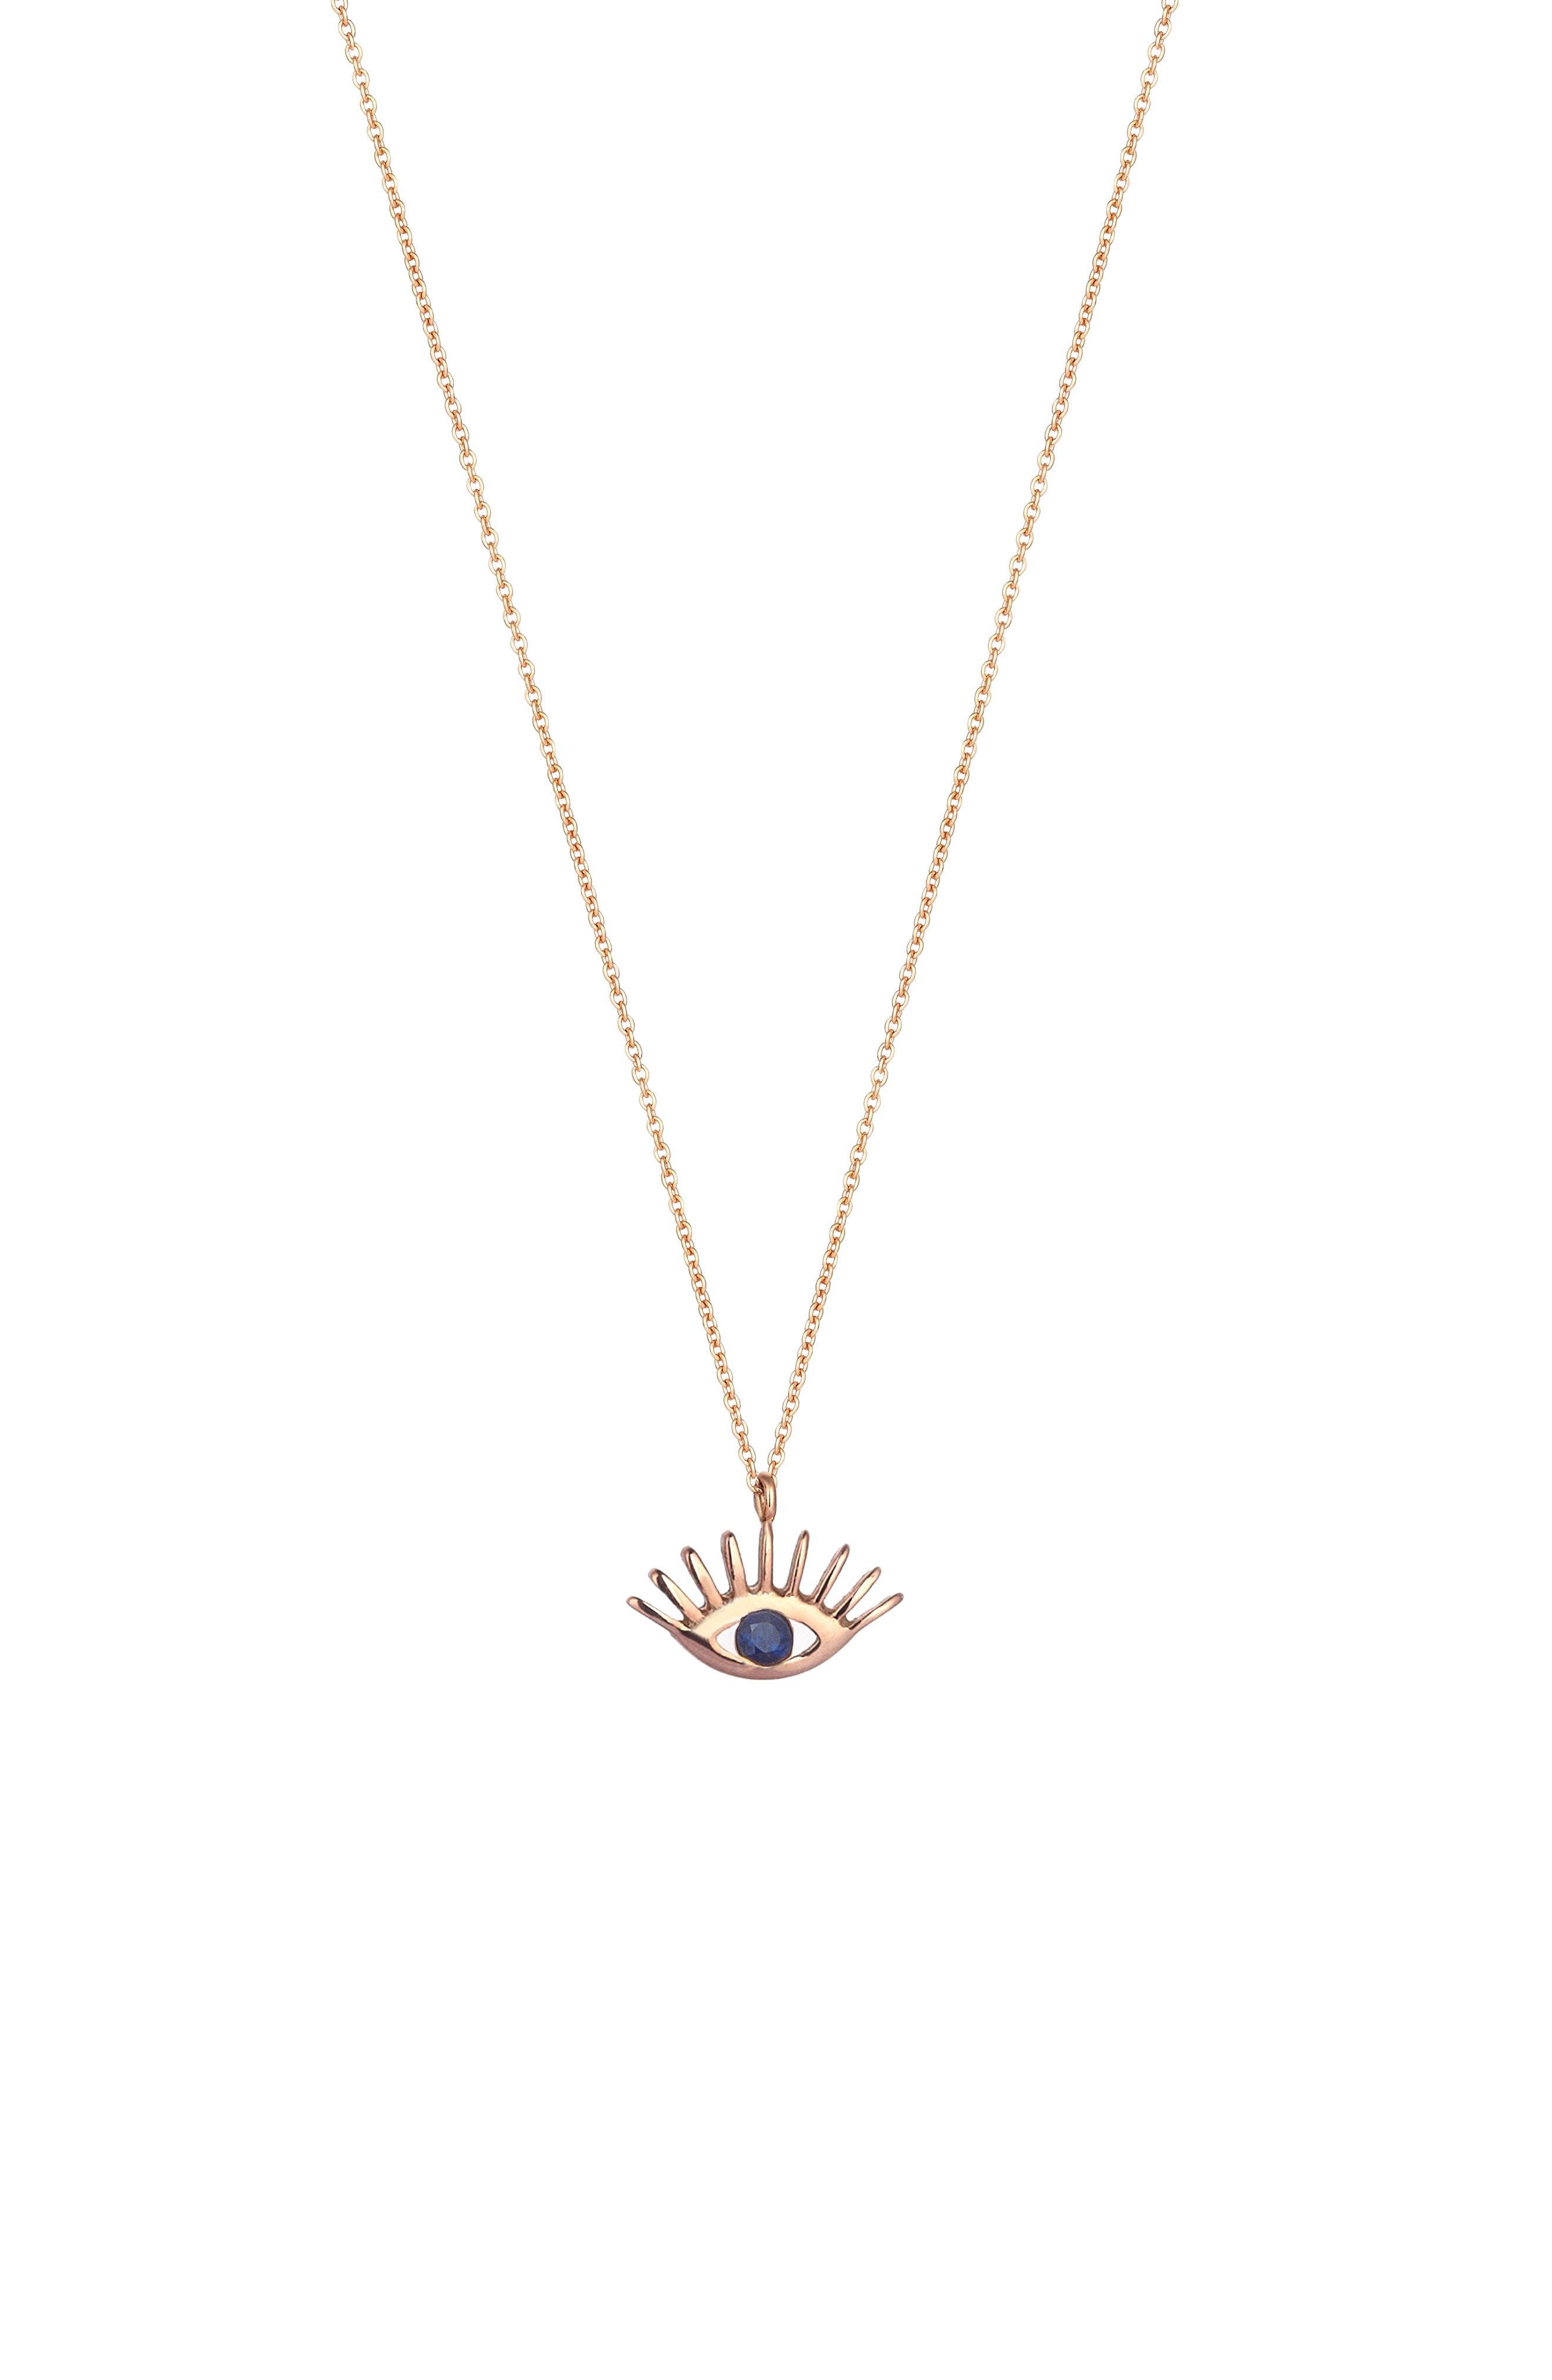 KISMET BY MILKA Sapphire Pendant Necklace, Main, color, ROSE GOLD